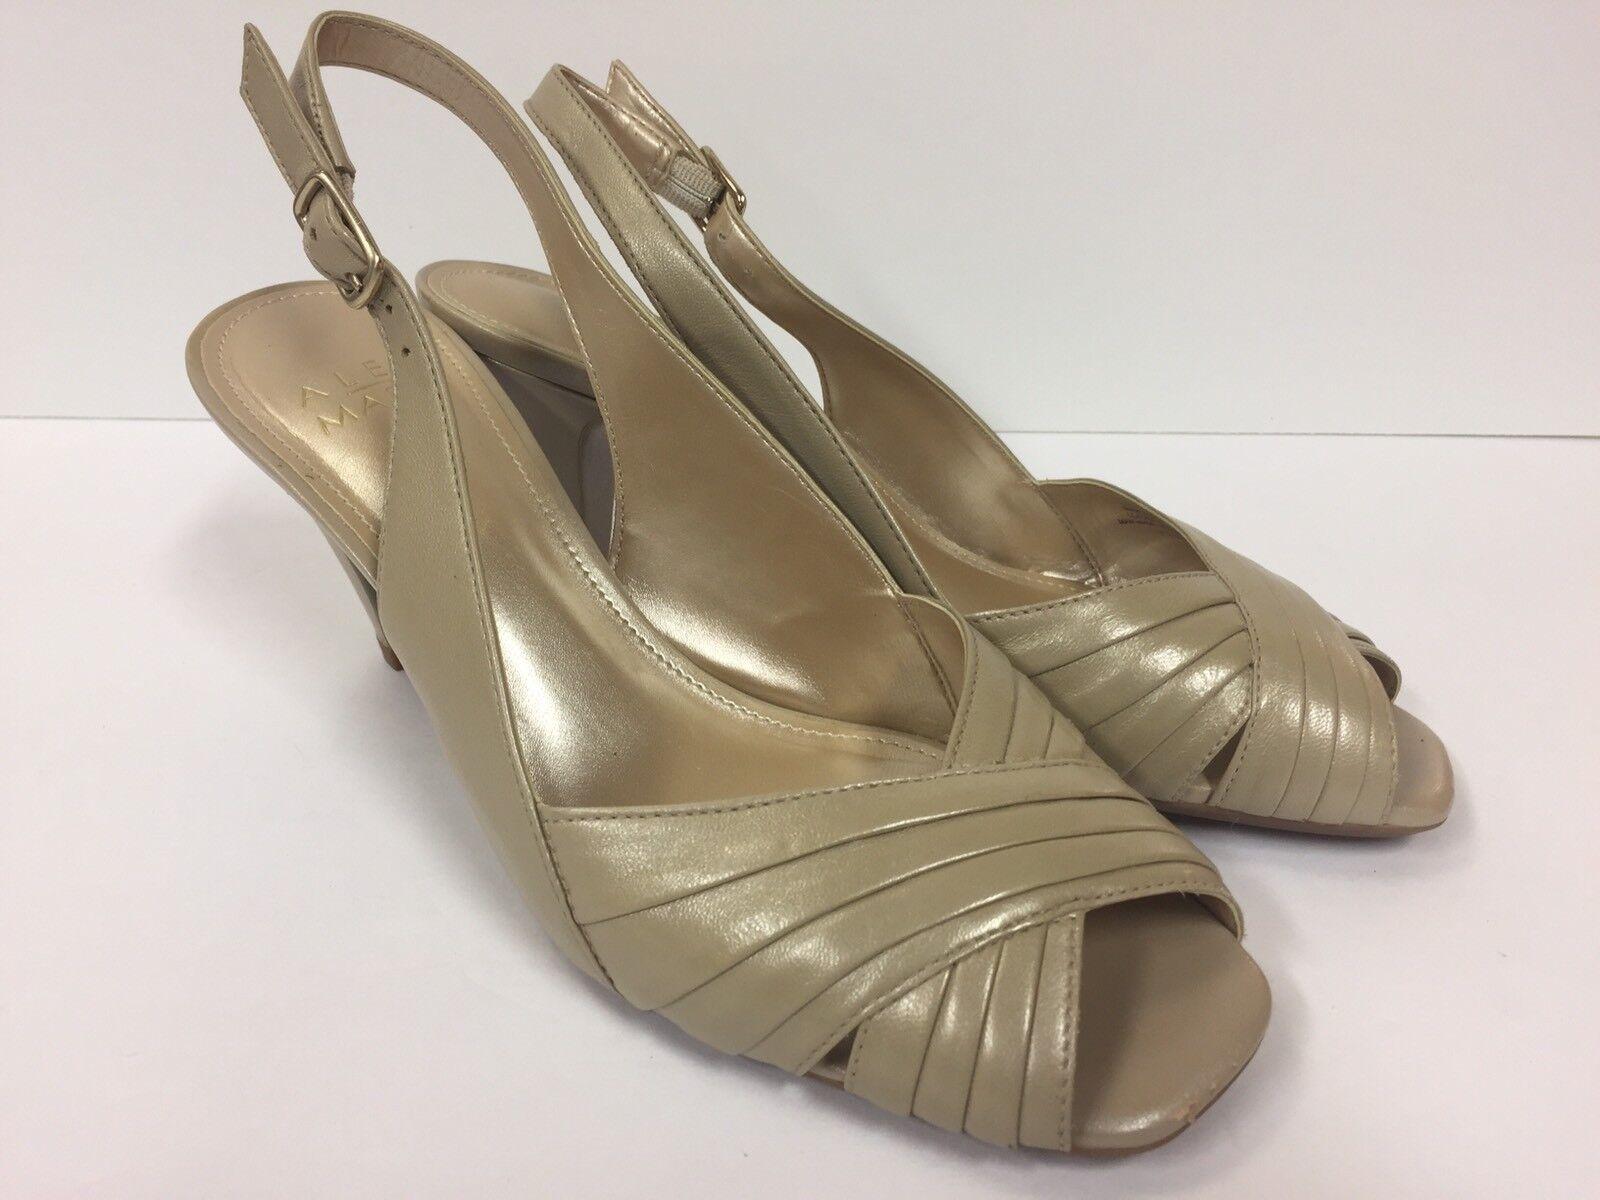 ALEX Slingback MARIE Peep Toe Slingback ALEX sz 7.5 Heels (RK730) 60b5ef